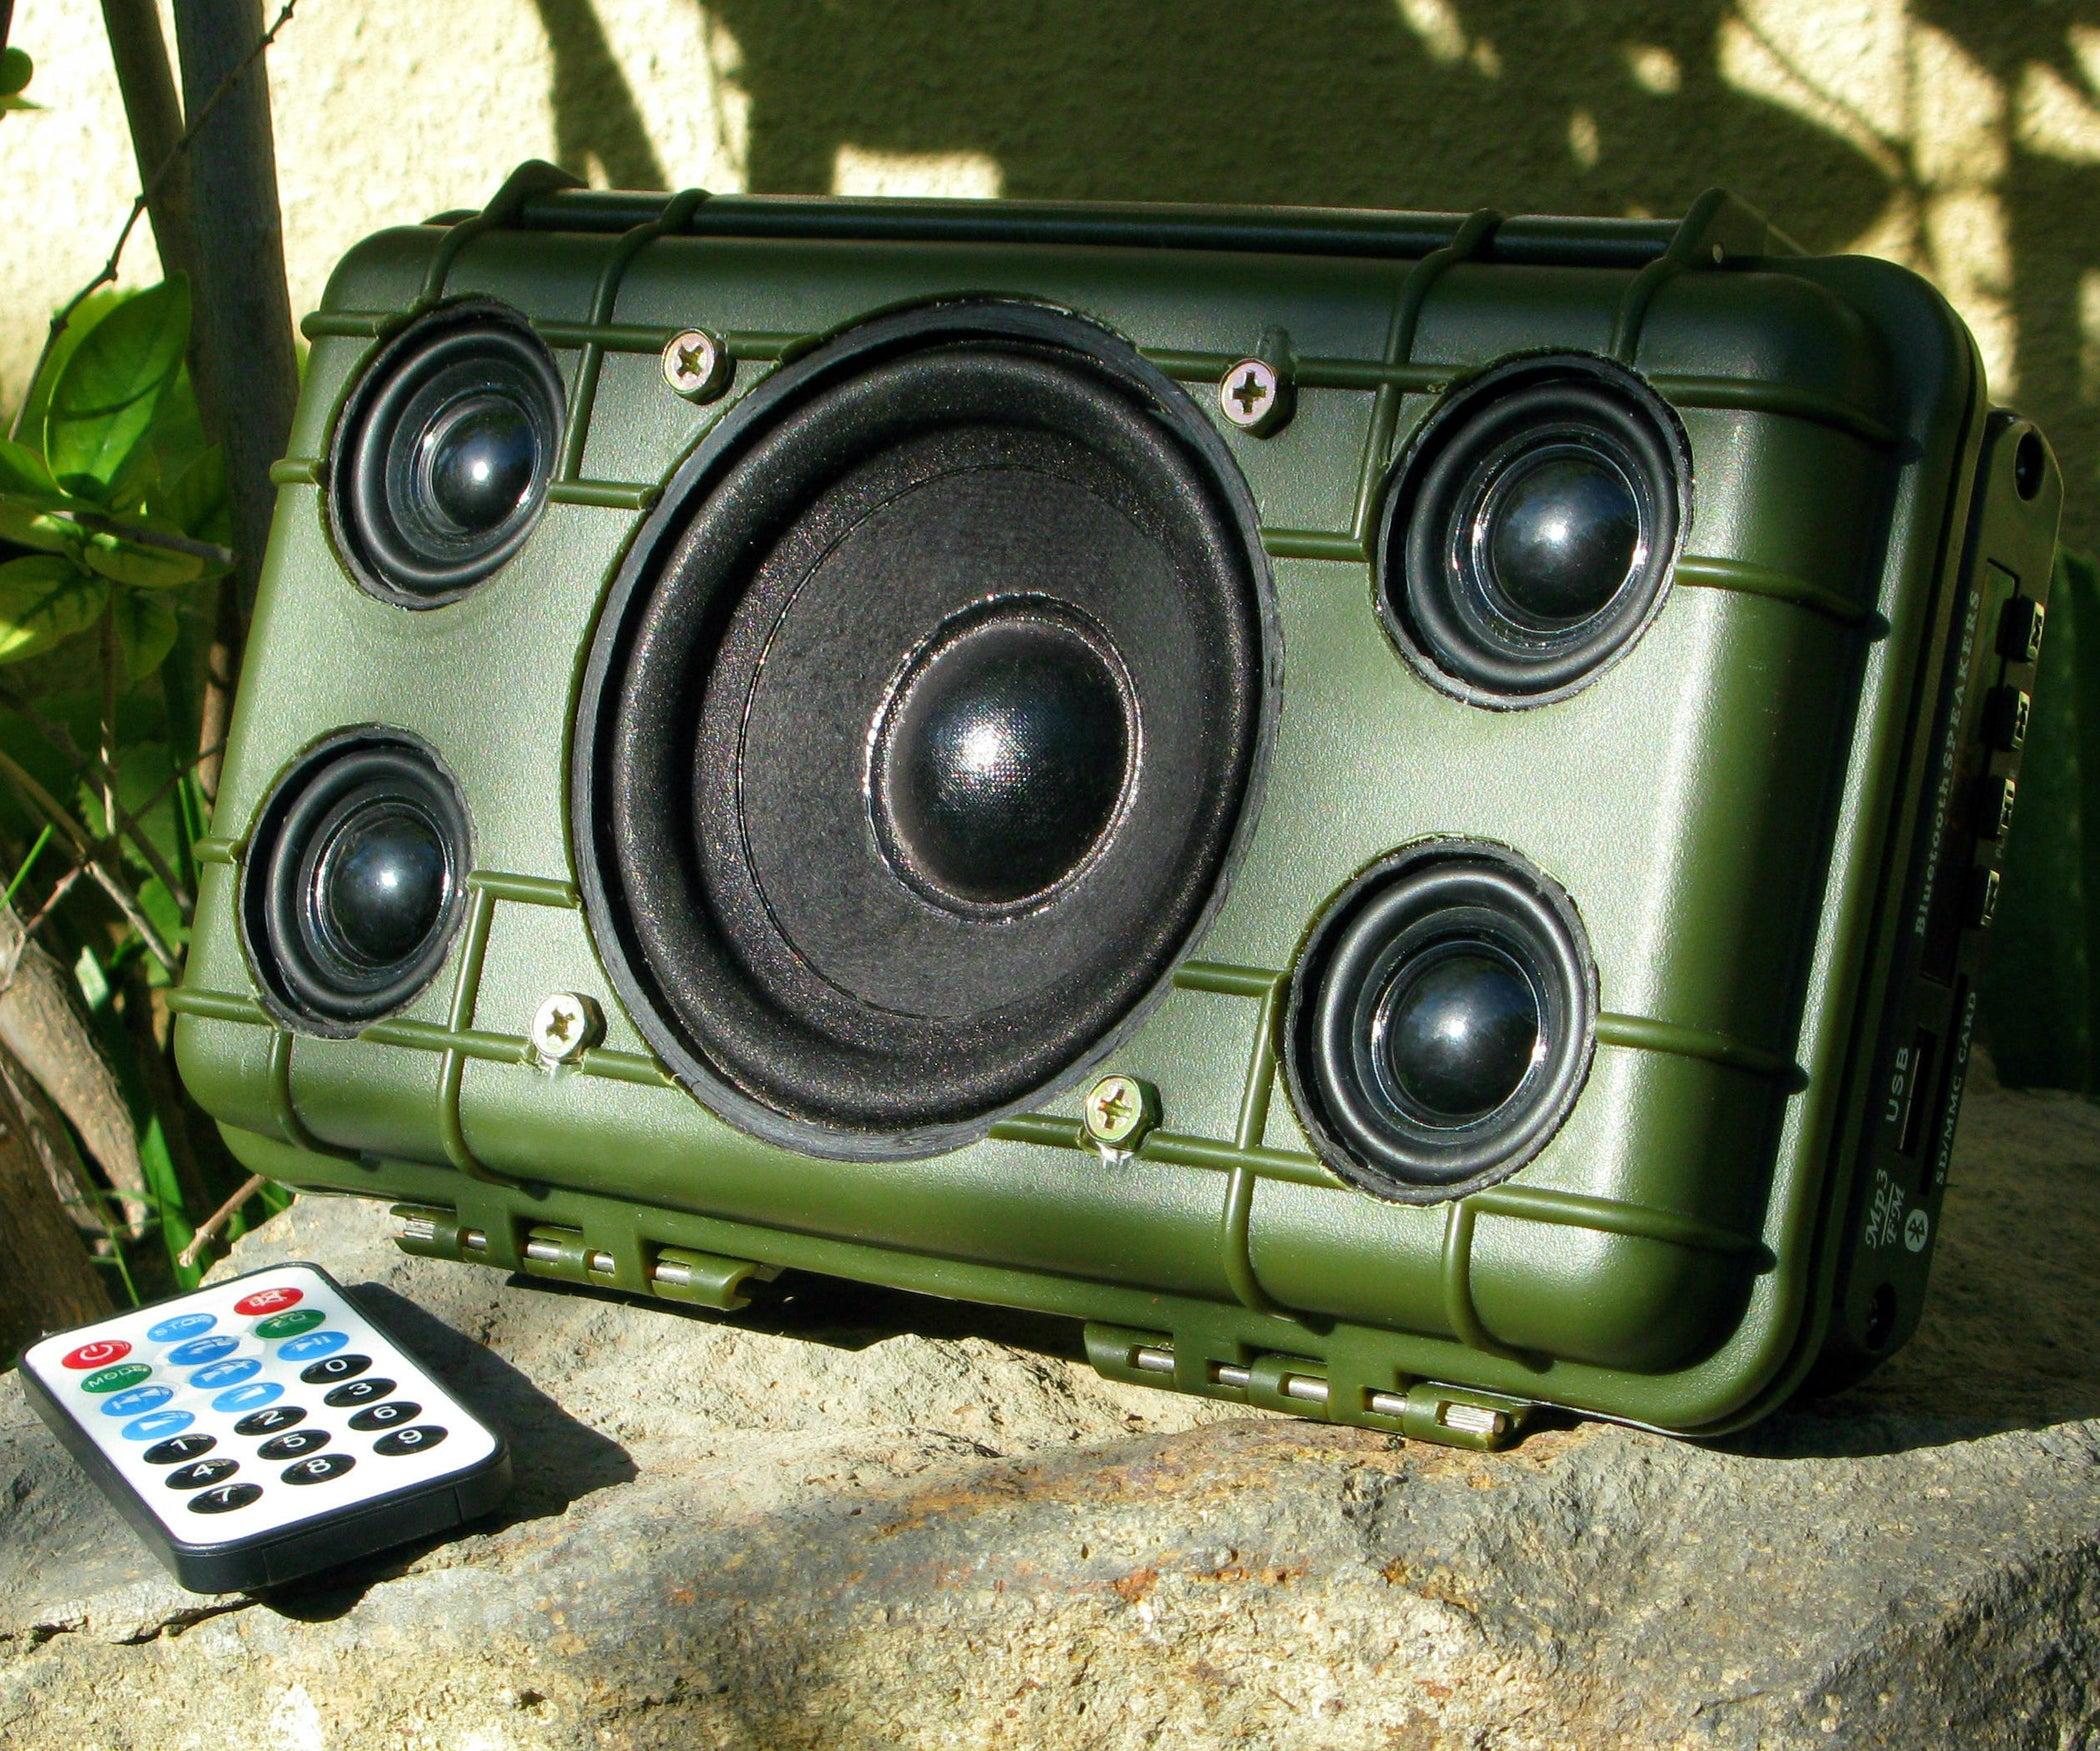 DIY Tough Bluetooth Boombox (Lasts 20hrs!)